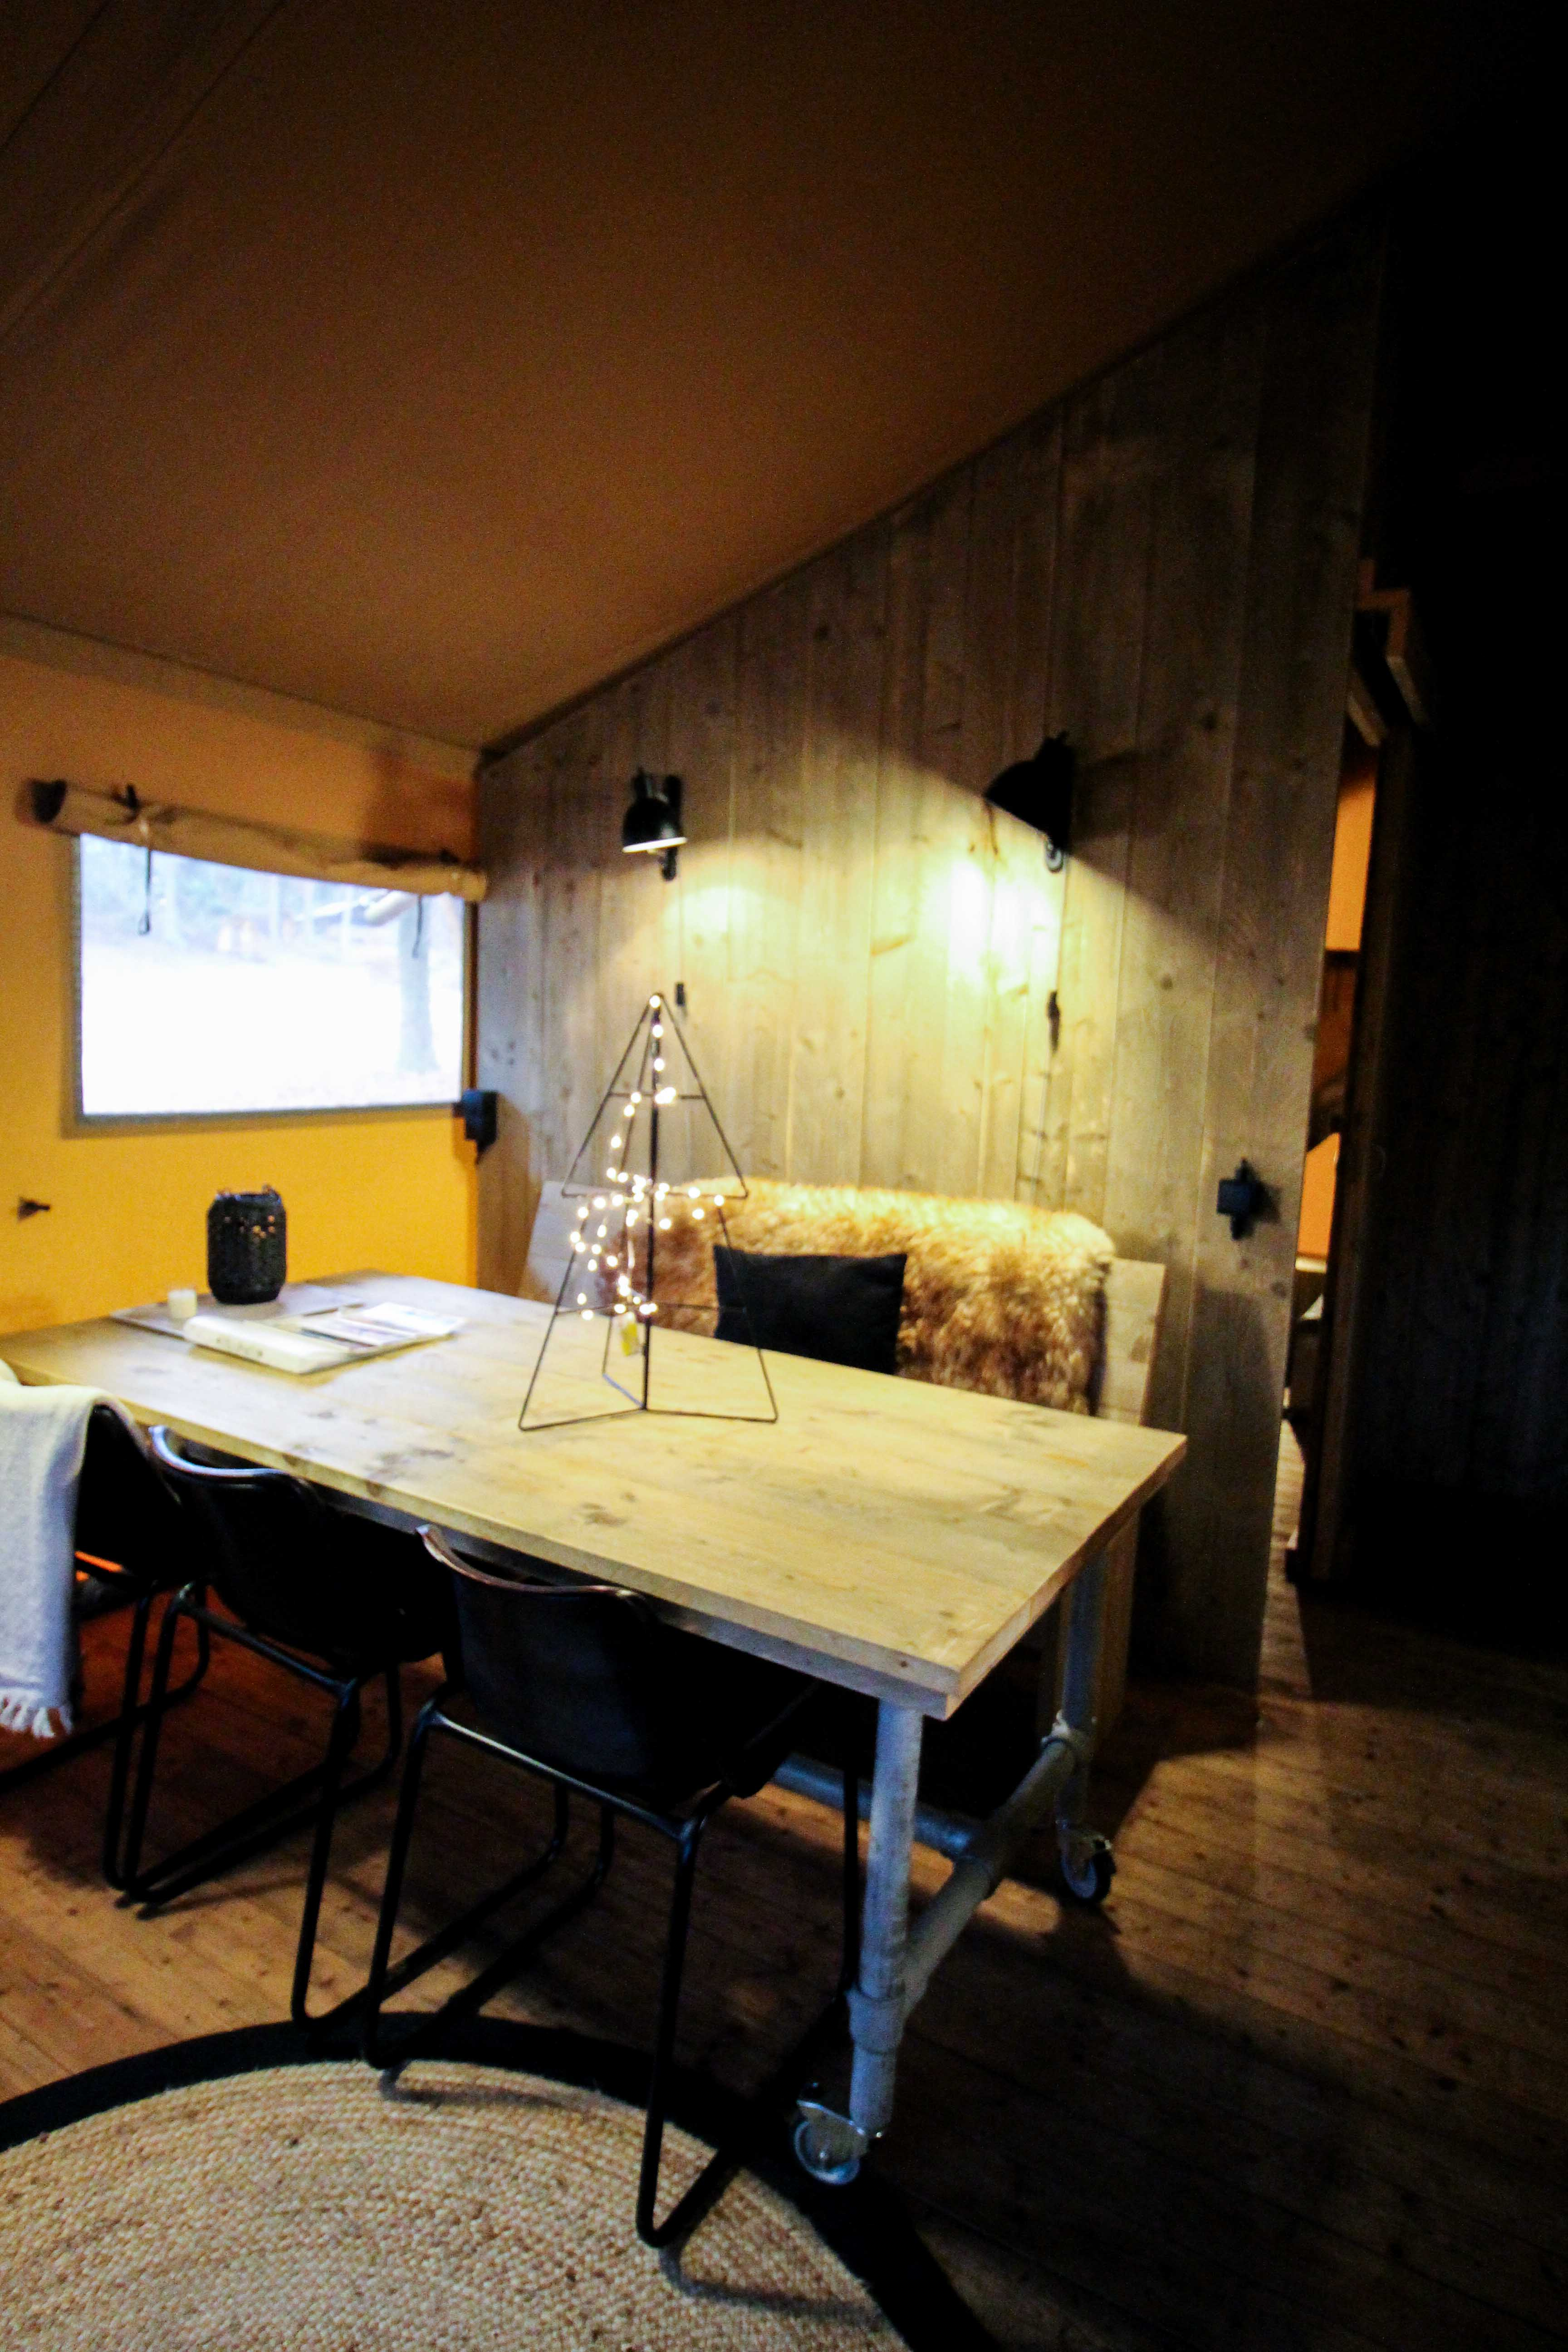 Glamping in Holland Luxuscamping Buitenplaats Beekhuizen Arnheim das andere Holland Reiseblog Zelt Lodgetent Wohnraum